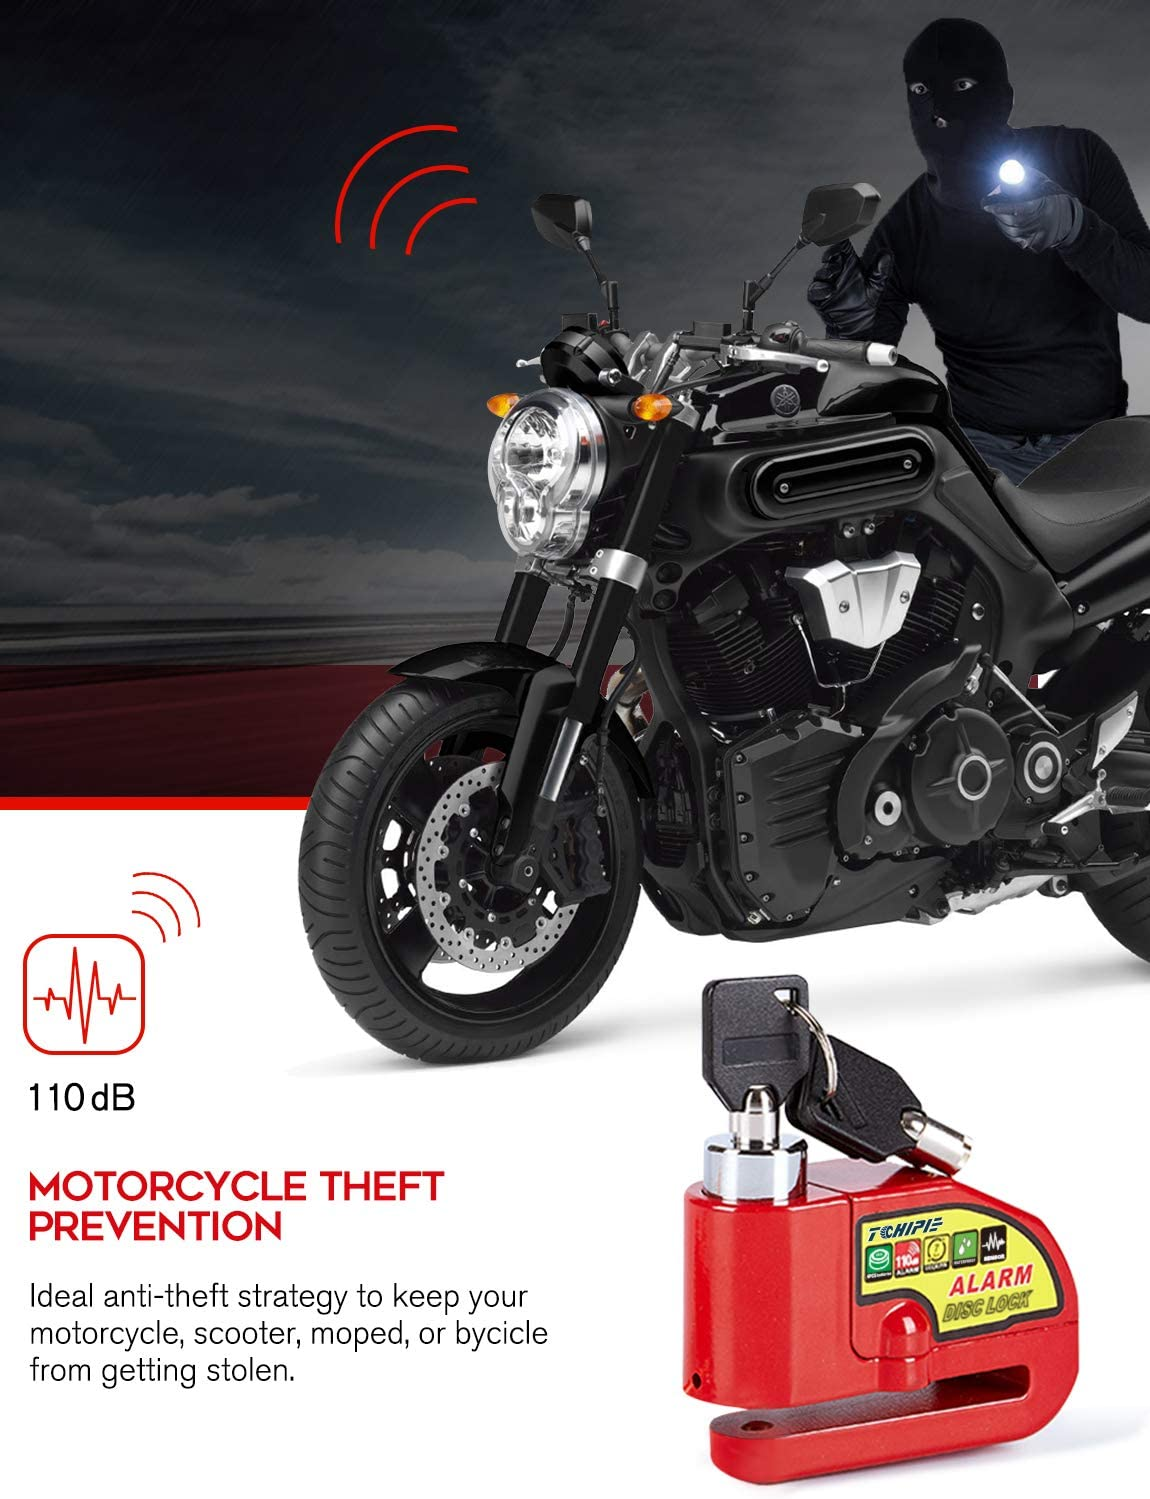 Motorcycle Bike Scooter Wheel Disc Brake Lock 110DB Alarm Anti theft Security FD